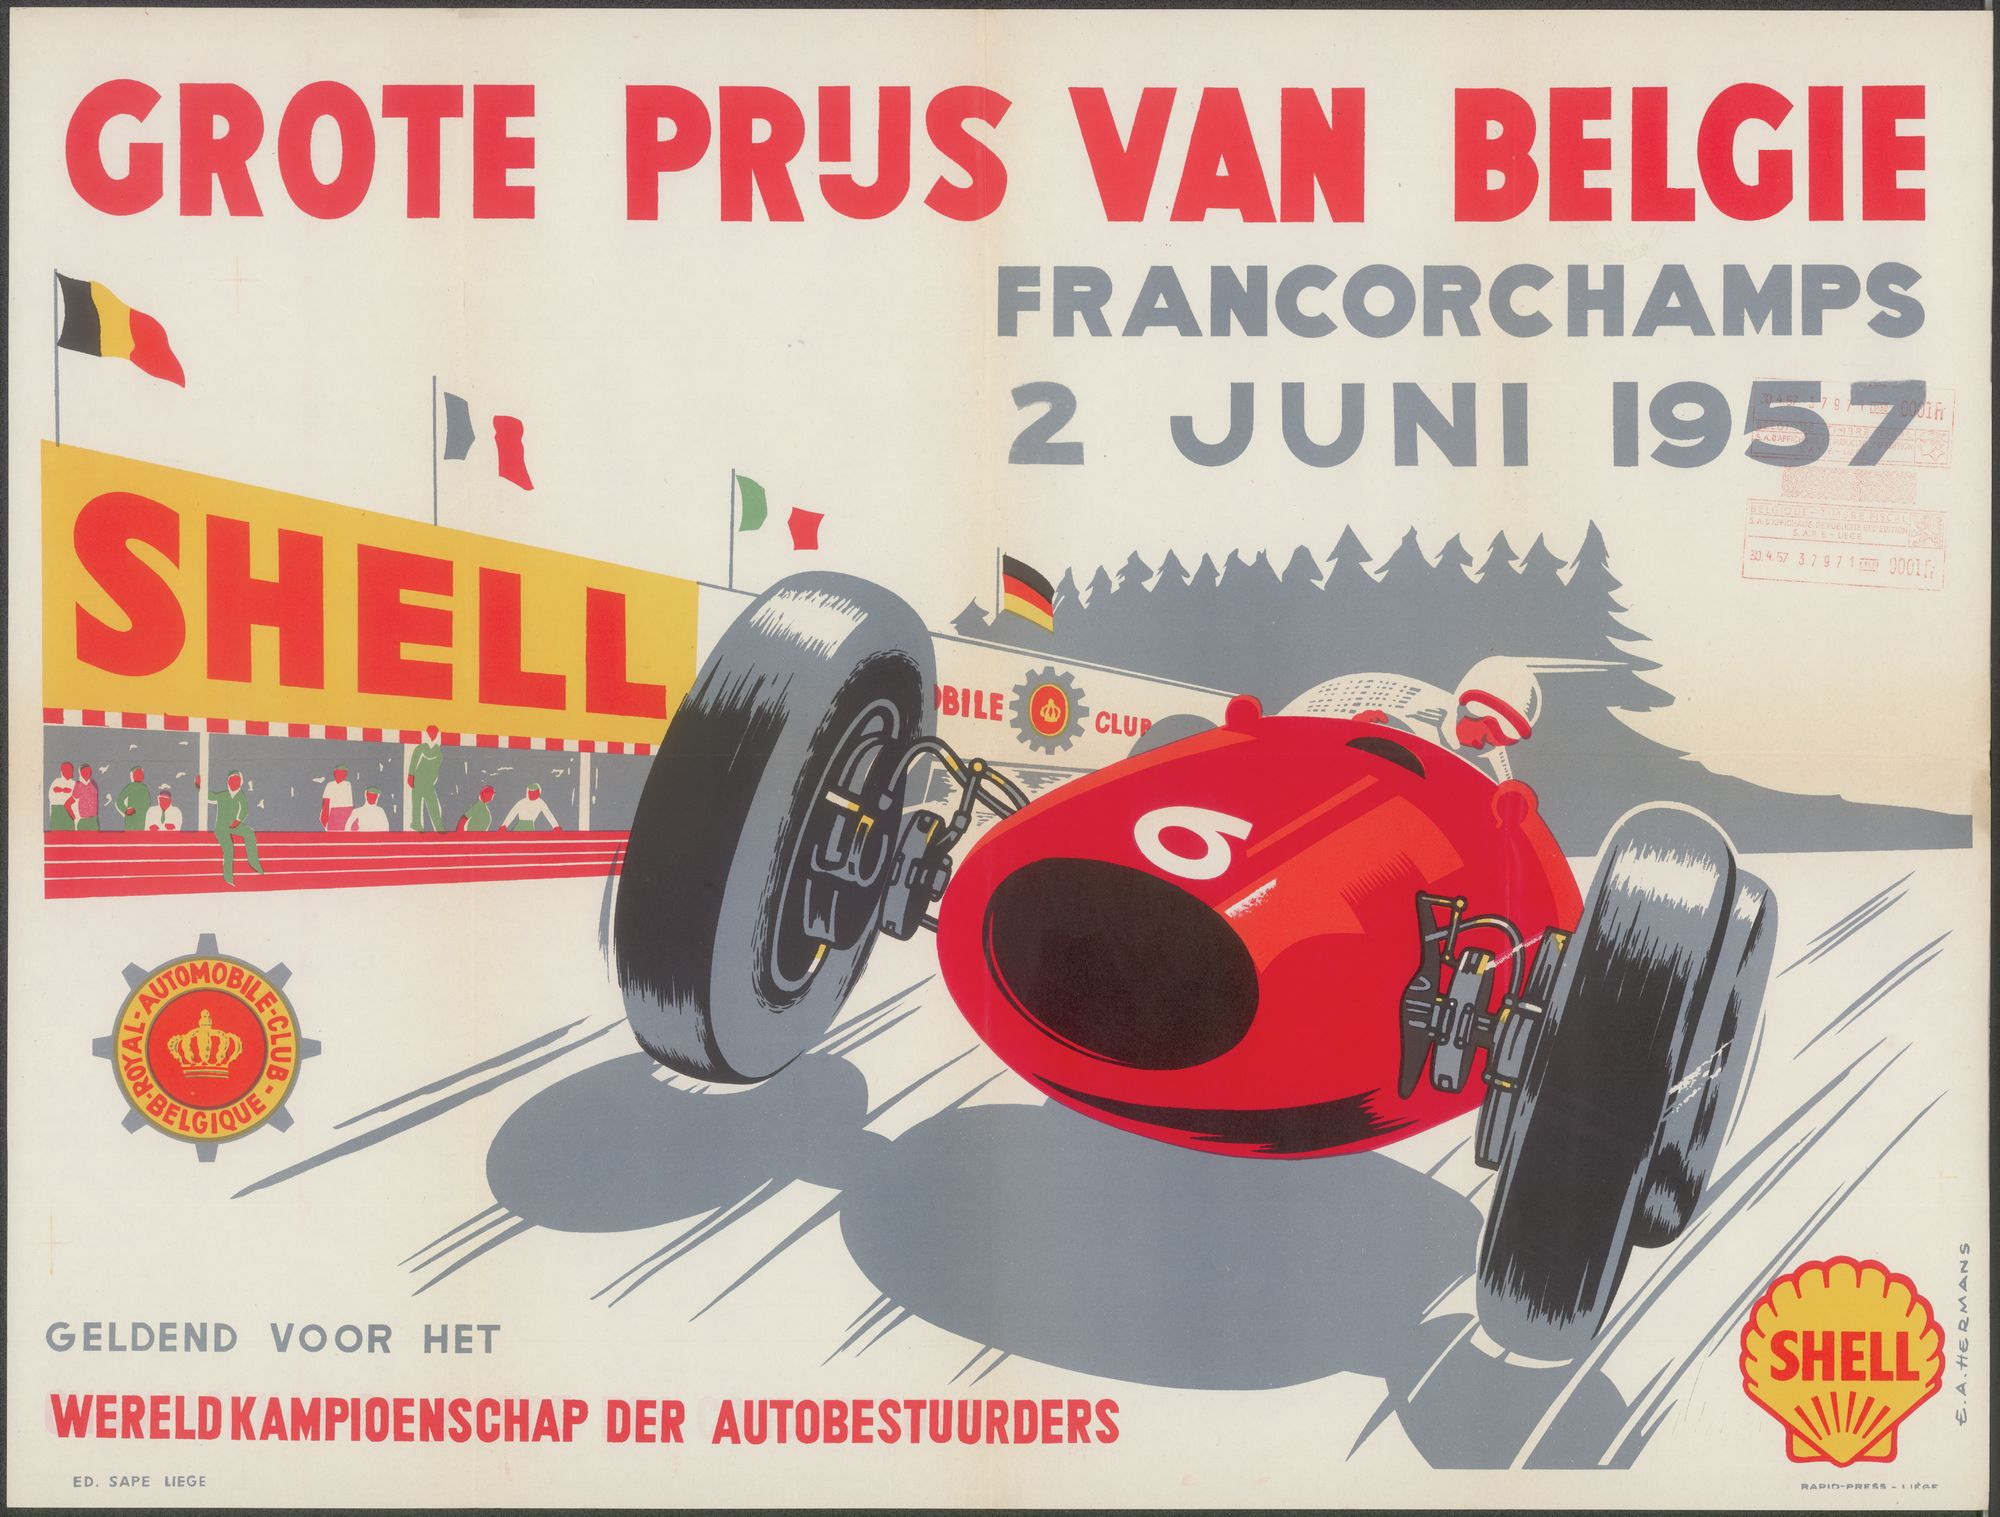 Francorchamps, Grote Prijs van België, te SPA - Francorchamps, 2 juni 1957